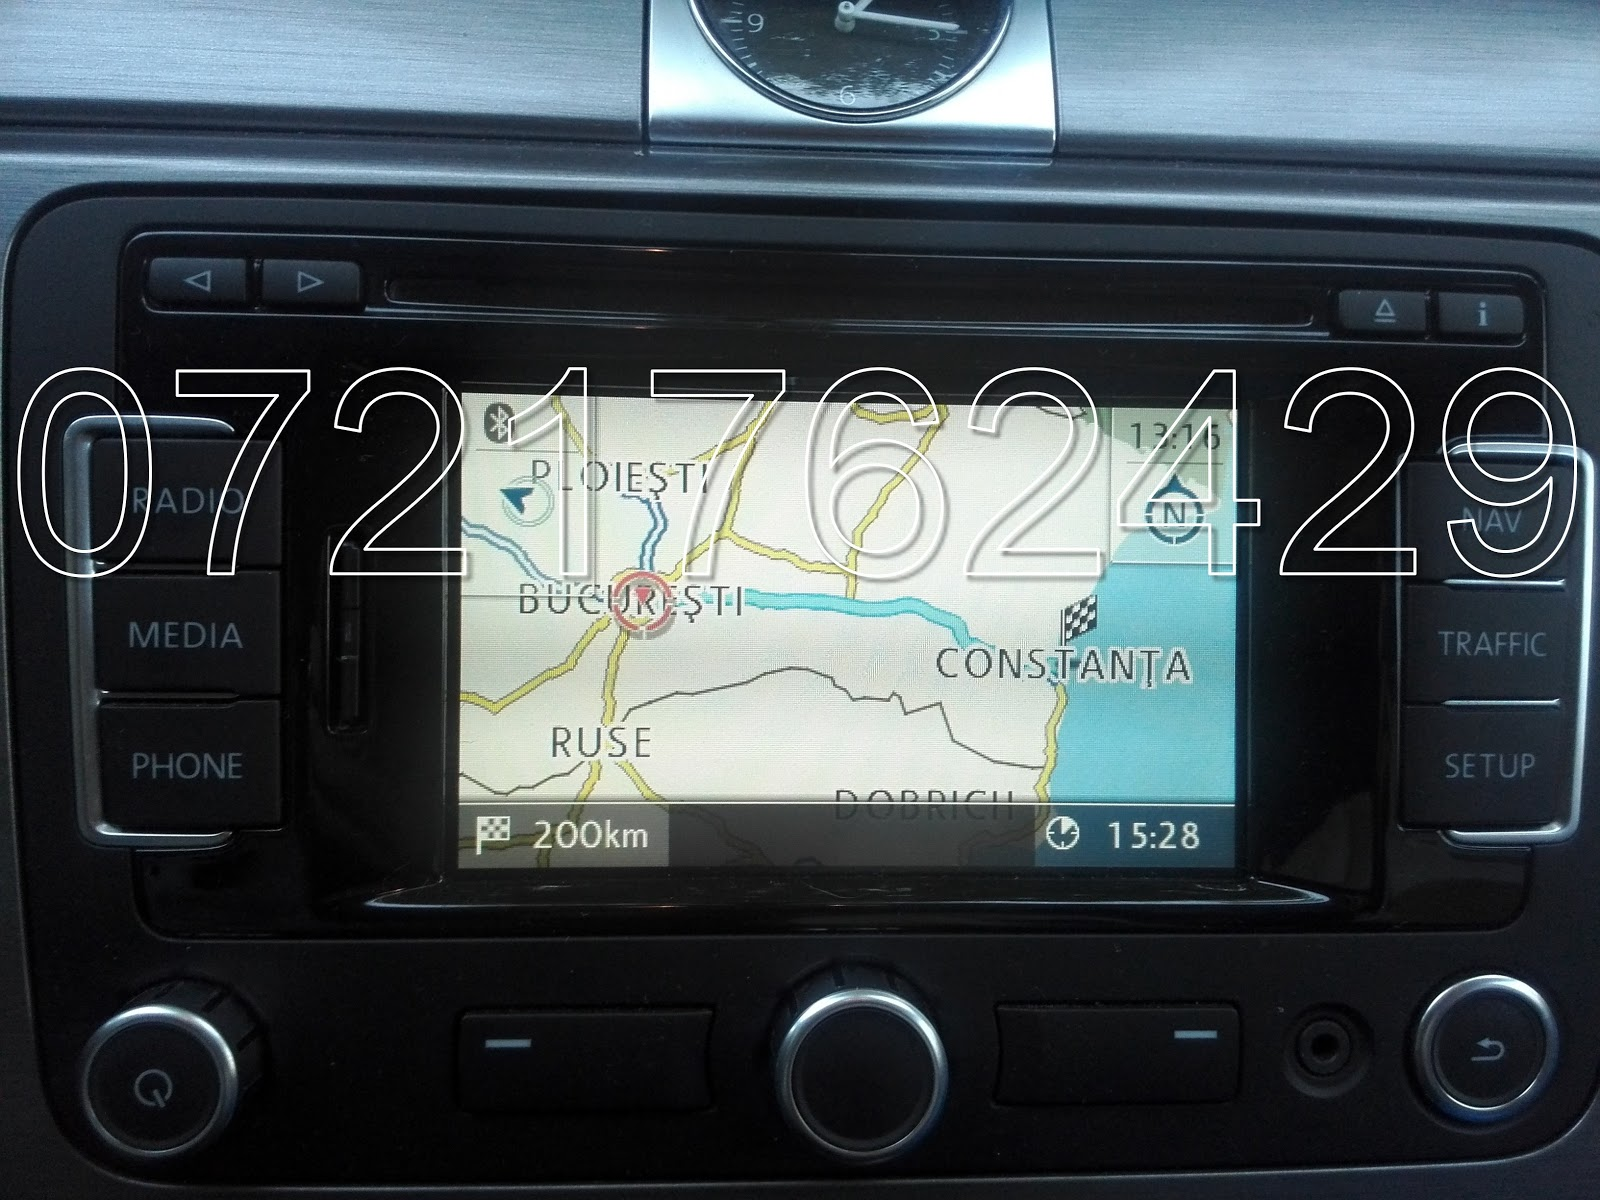 Hedendaags HARTA CD DVD NAVIGATIE BMW MERCEDES AUDI OPEL HONDA NISSAN RENAULT HT-23